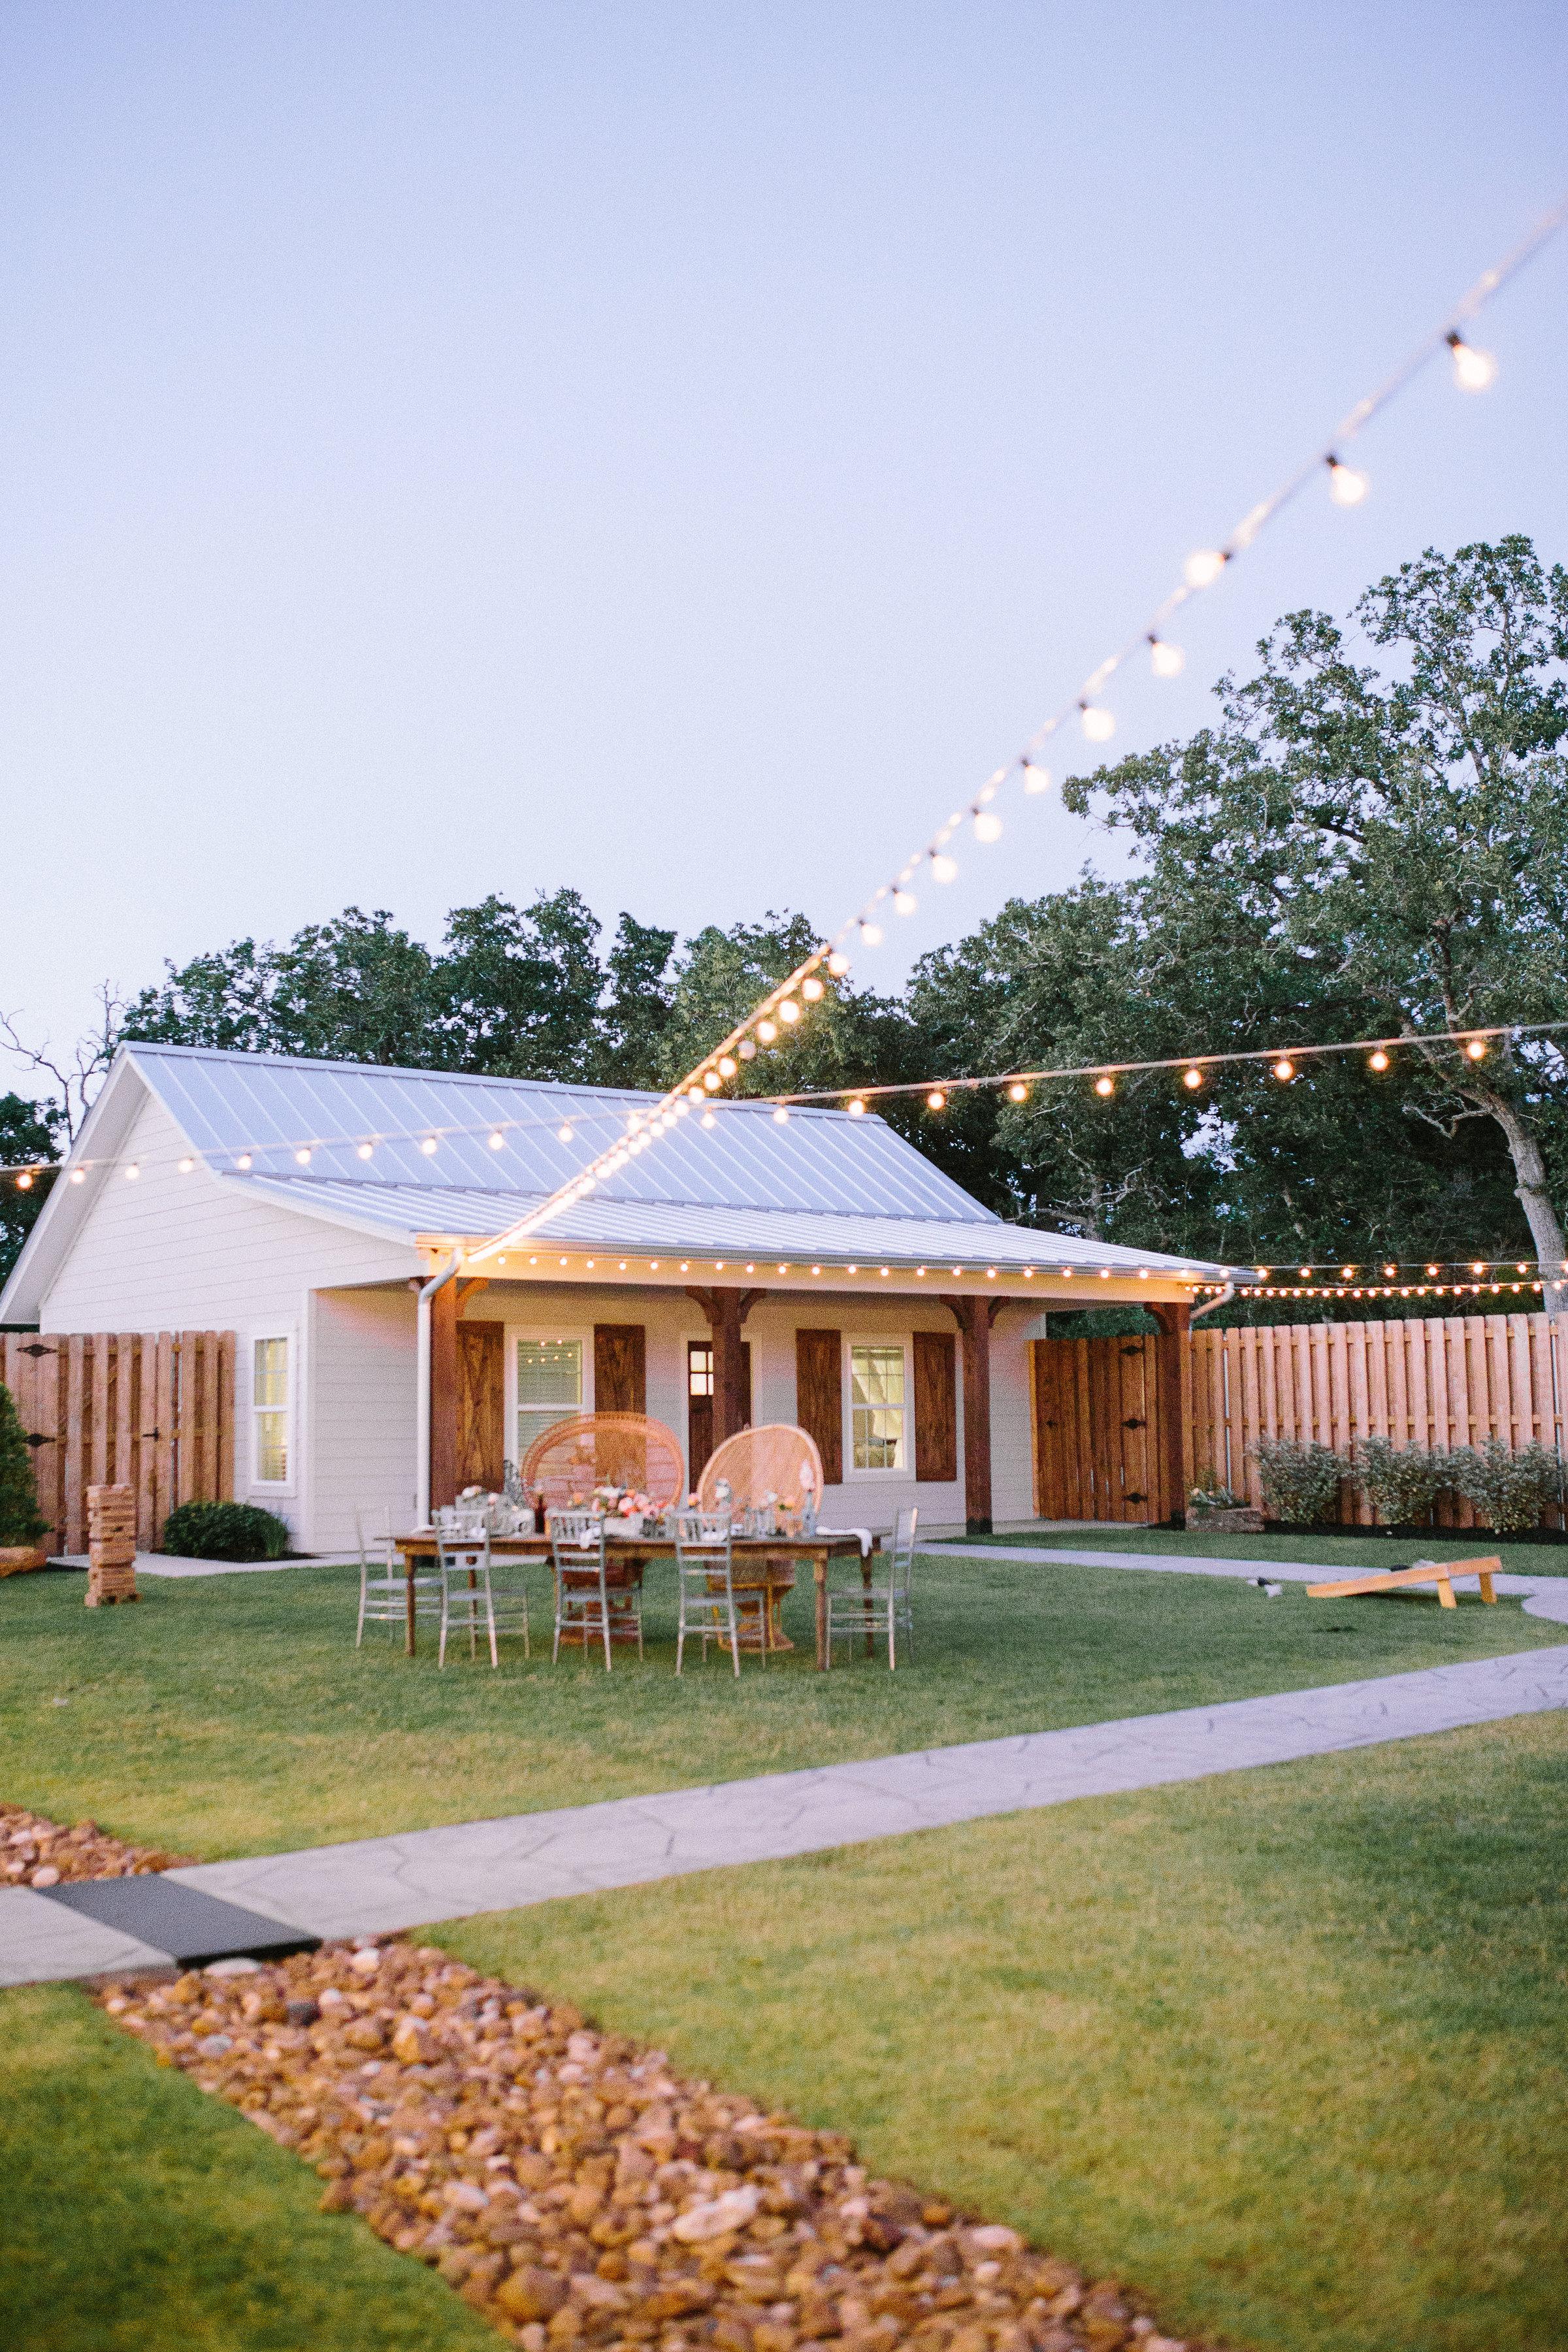 Ellen-Ashton-Photography-Peach-Creek-Ranch-Weddings-Wed-and-Prosper148.jpg